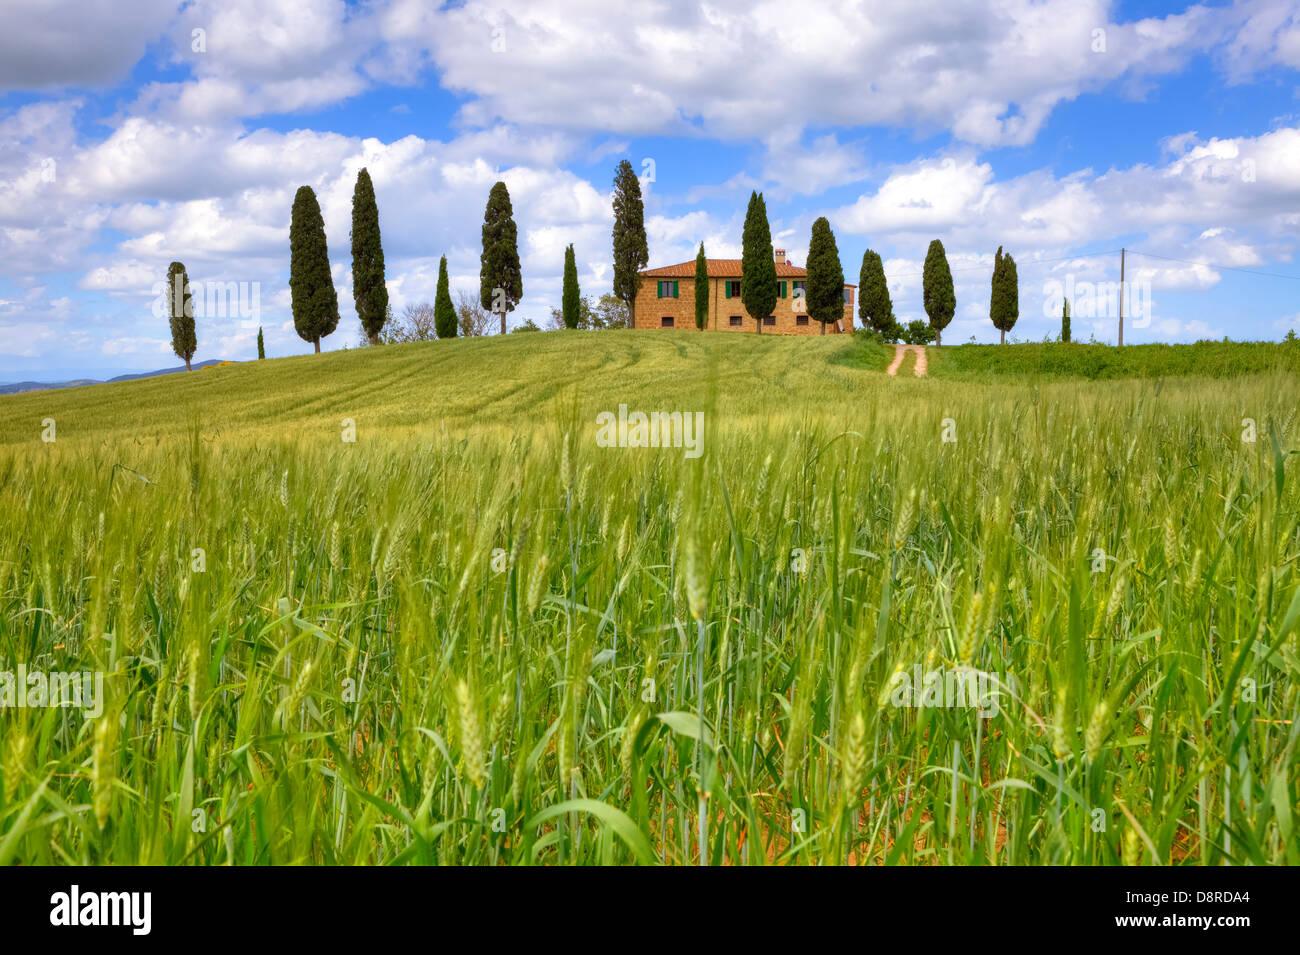 farm house in Val d'Orcia, Pienza, Tuscany, Italy - Stock Image